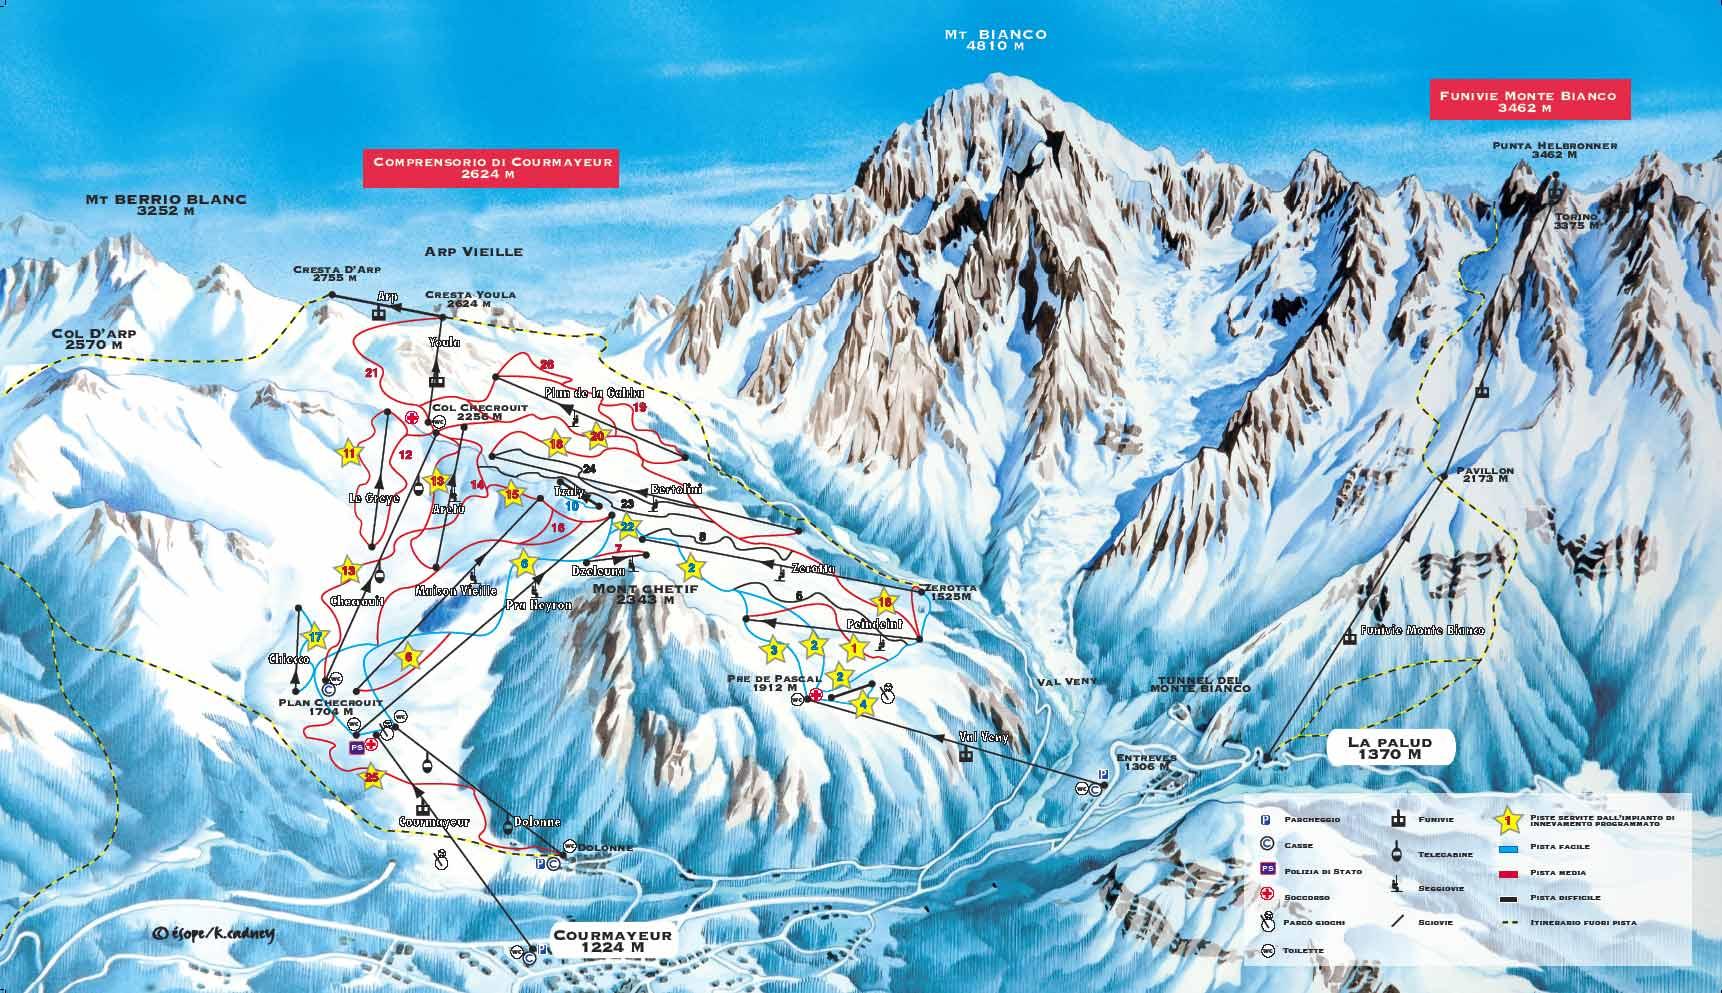 Courmayeur Ski Resort Italy Ski Line